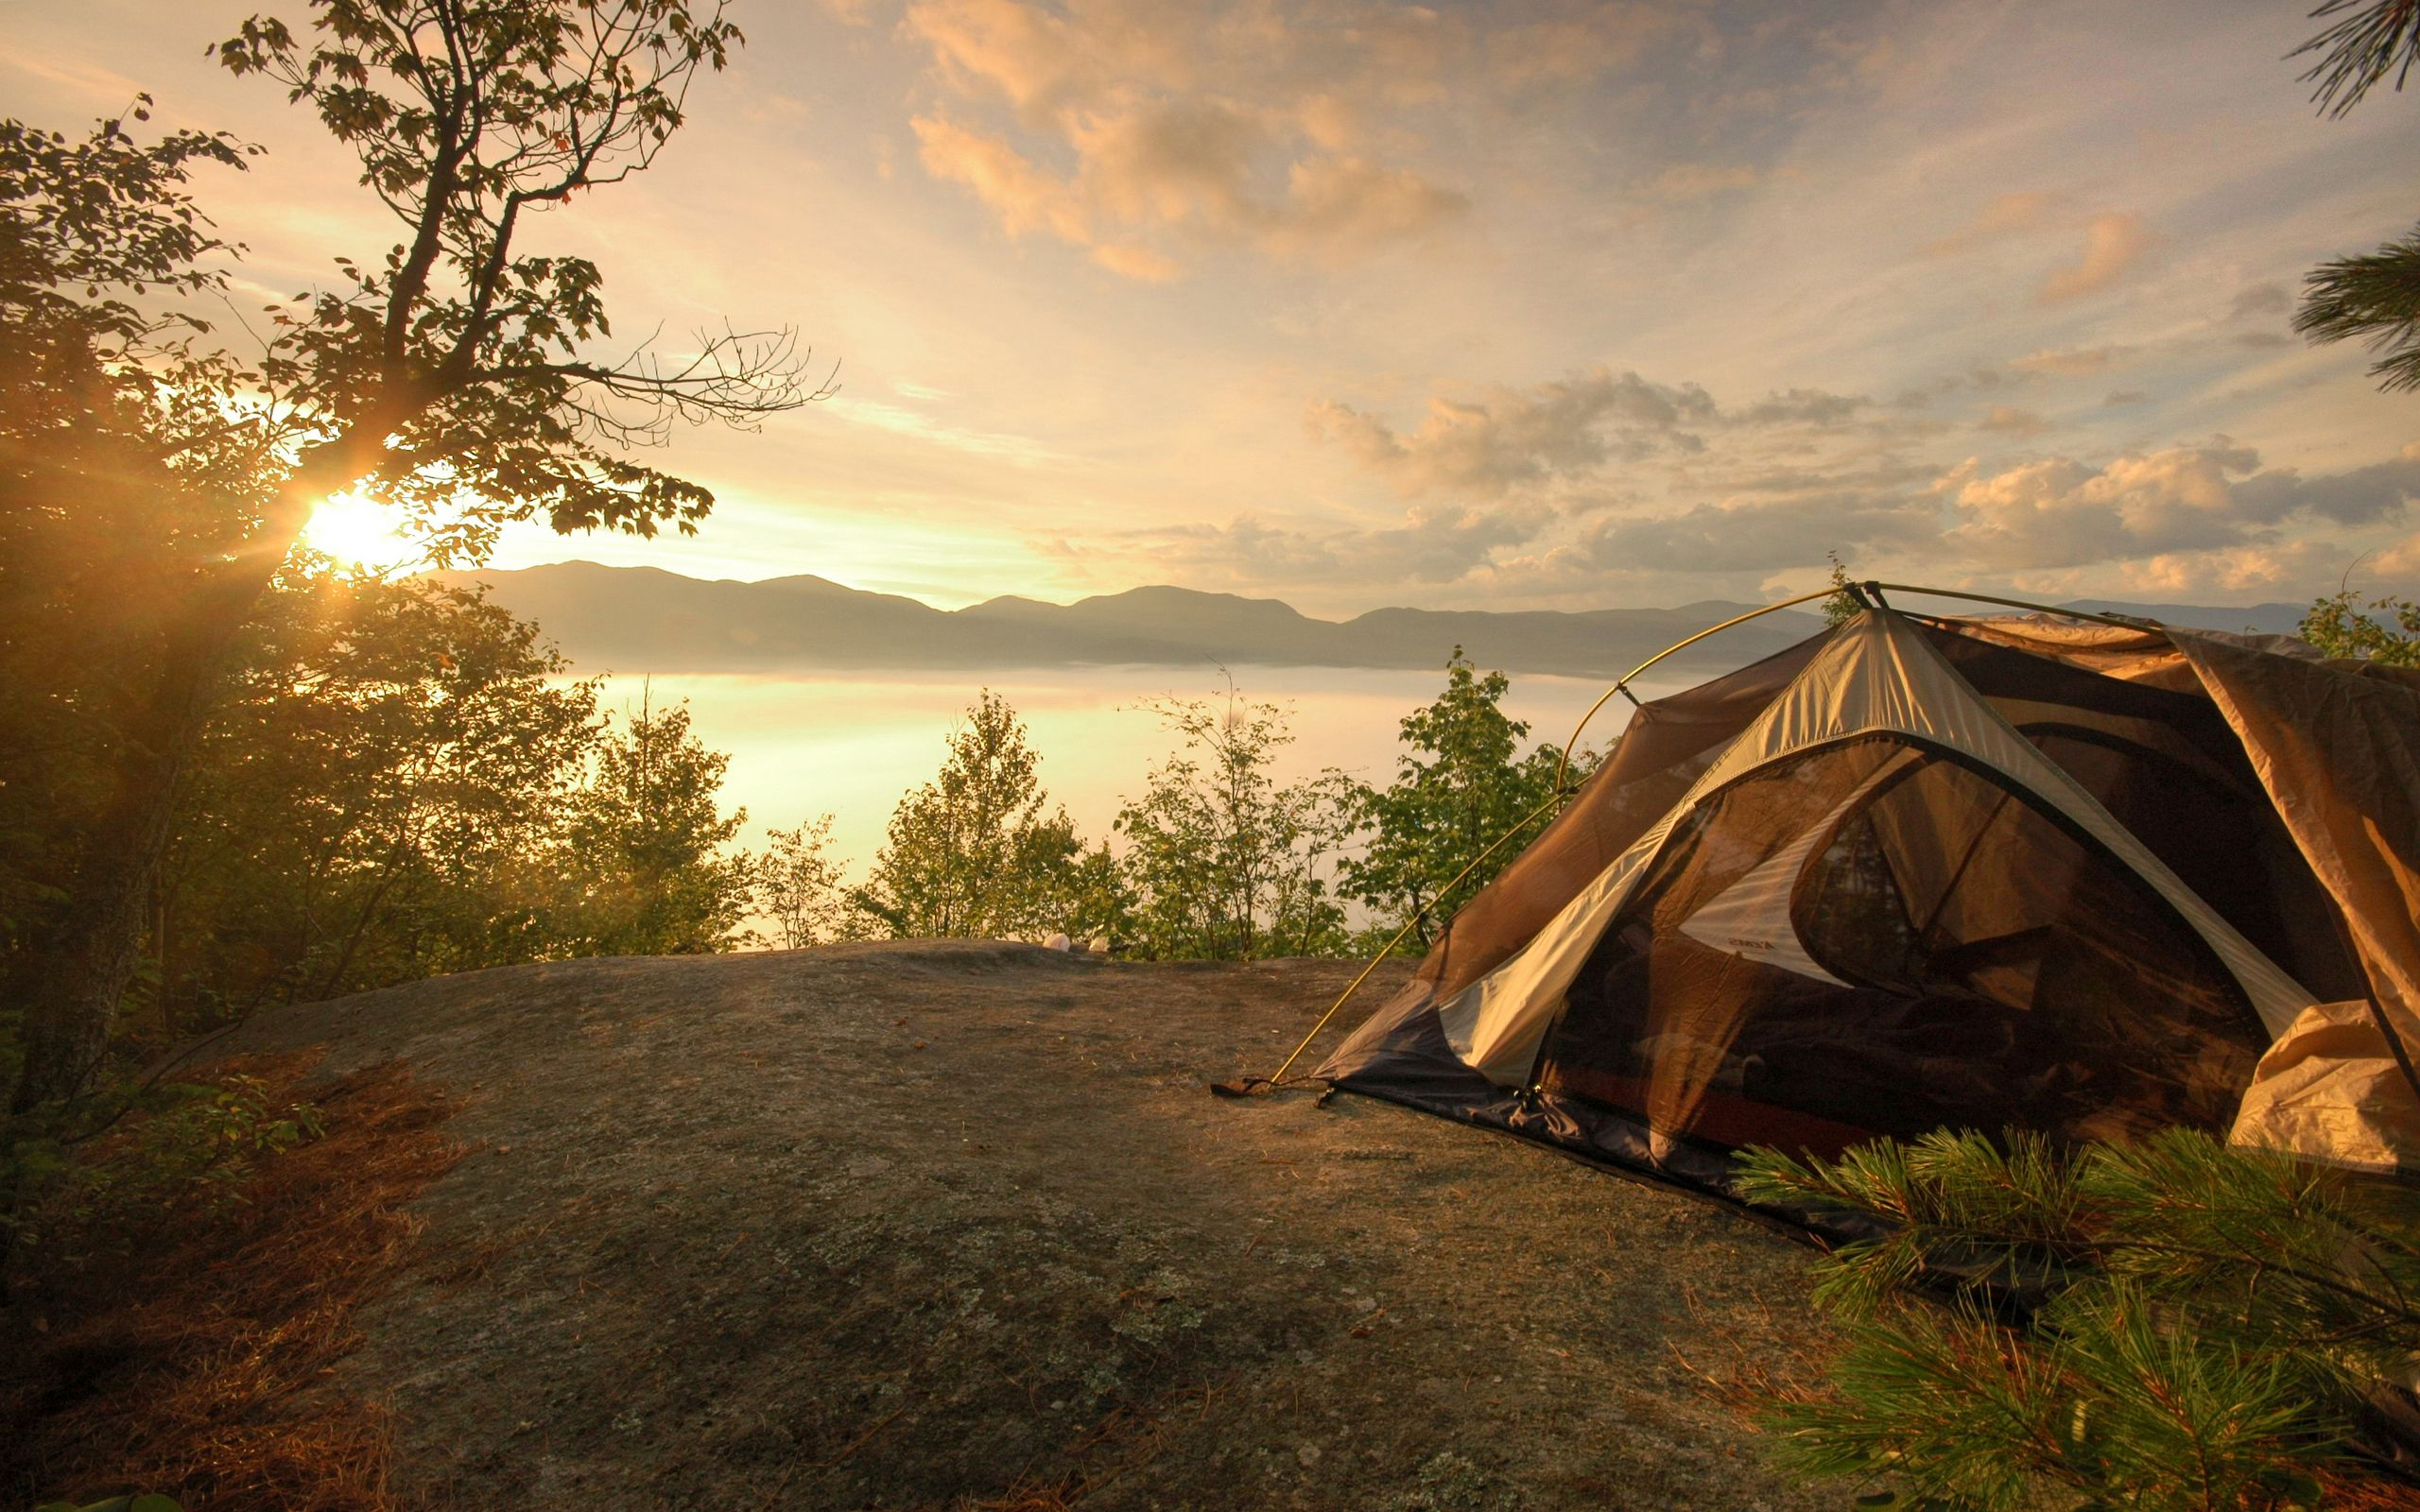 Campsite Wallpapers   Top Campsite Backgrounds   WallpaperAccess 2560x1600